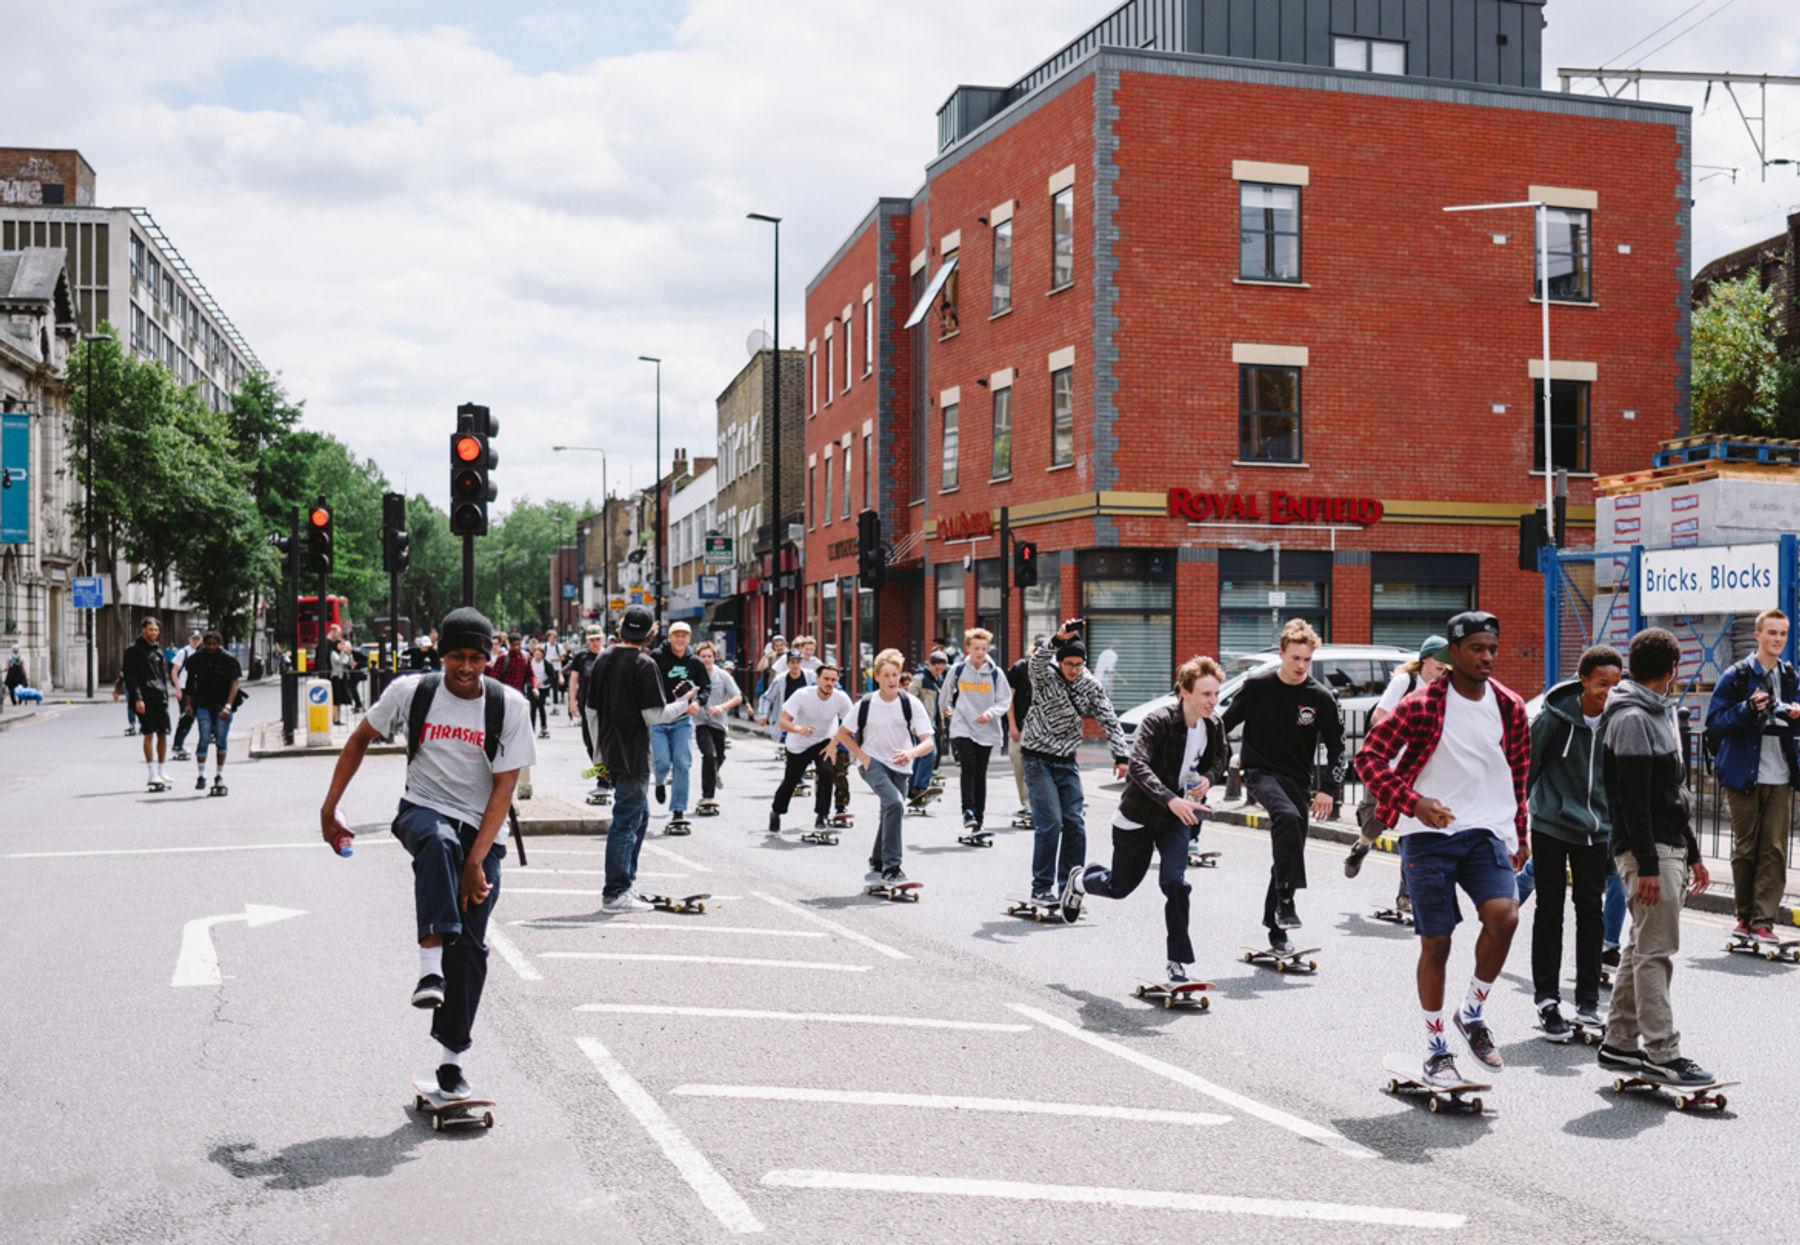 _IHC7414e-Nike-SB-x-Slam-City-Skates-Go-Skateboarding-Day-London-June-2015-Photographer-Maksim-Kalanep